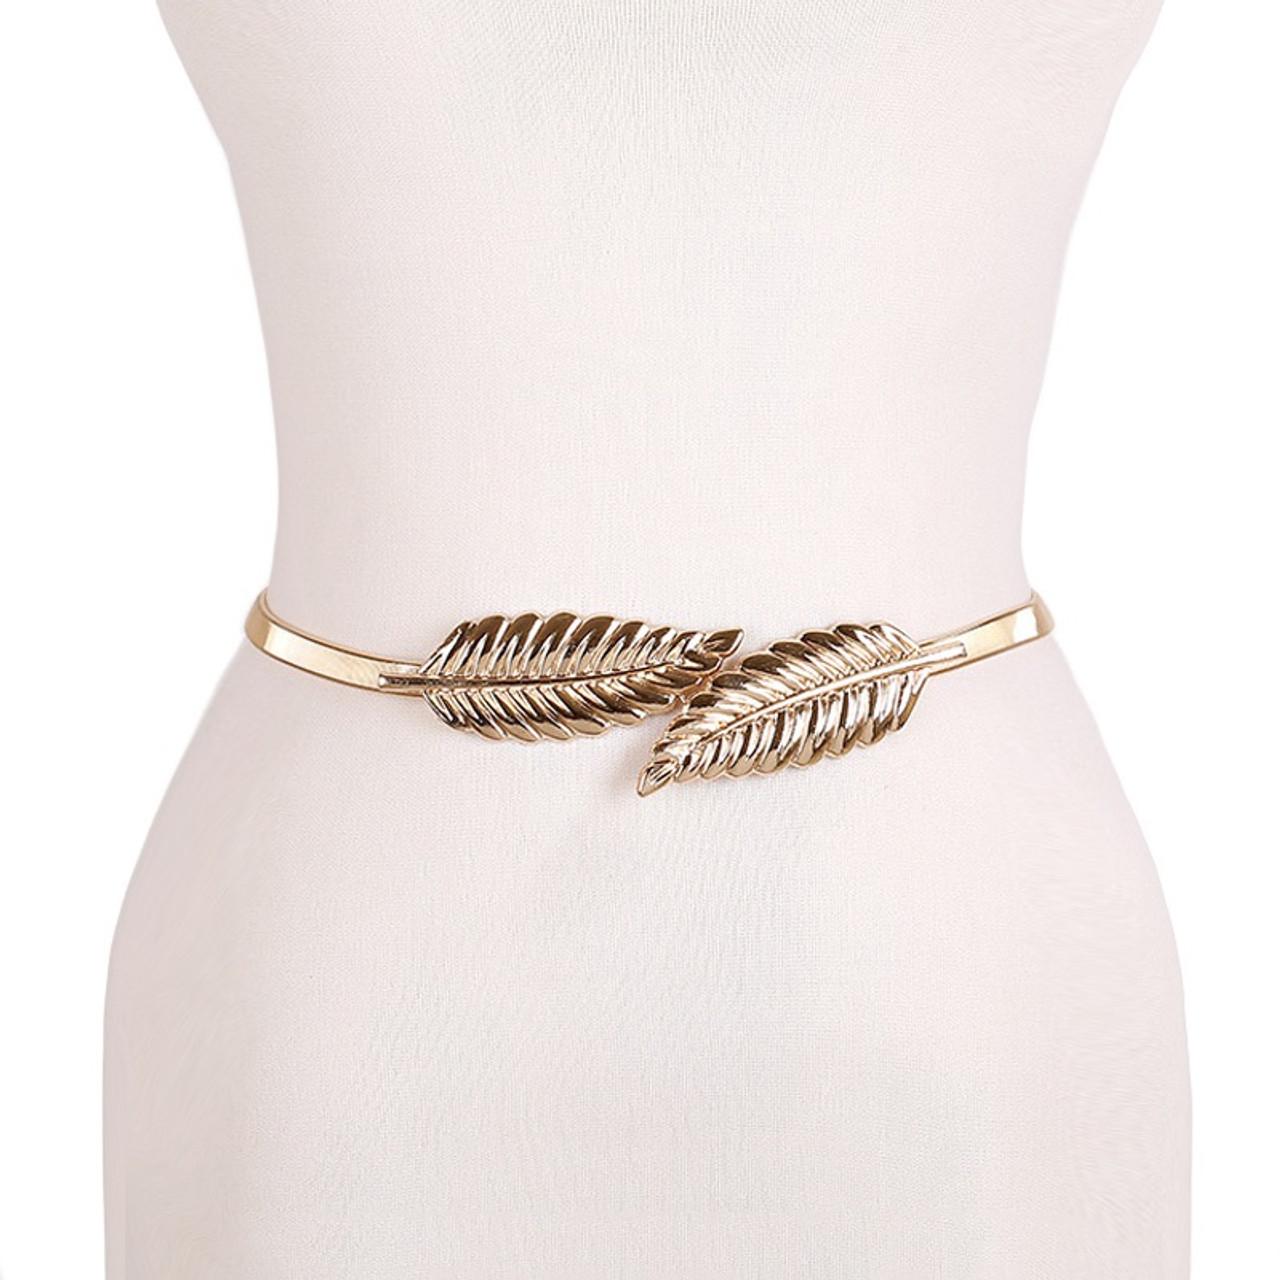 5a0423d81a5 gold silvery leaf shape Wedding designer Elastic belts for women  girl,Stretch Skinny Waist Belt Cummerbunds metal female belt